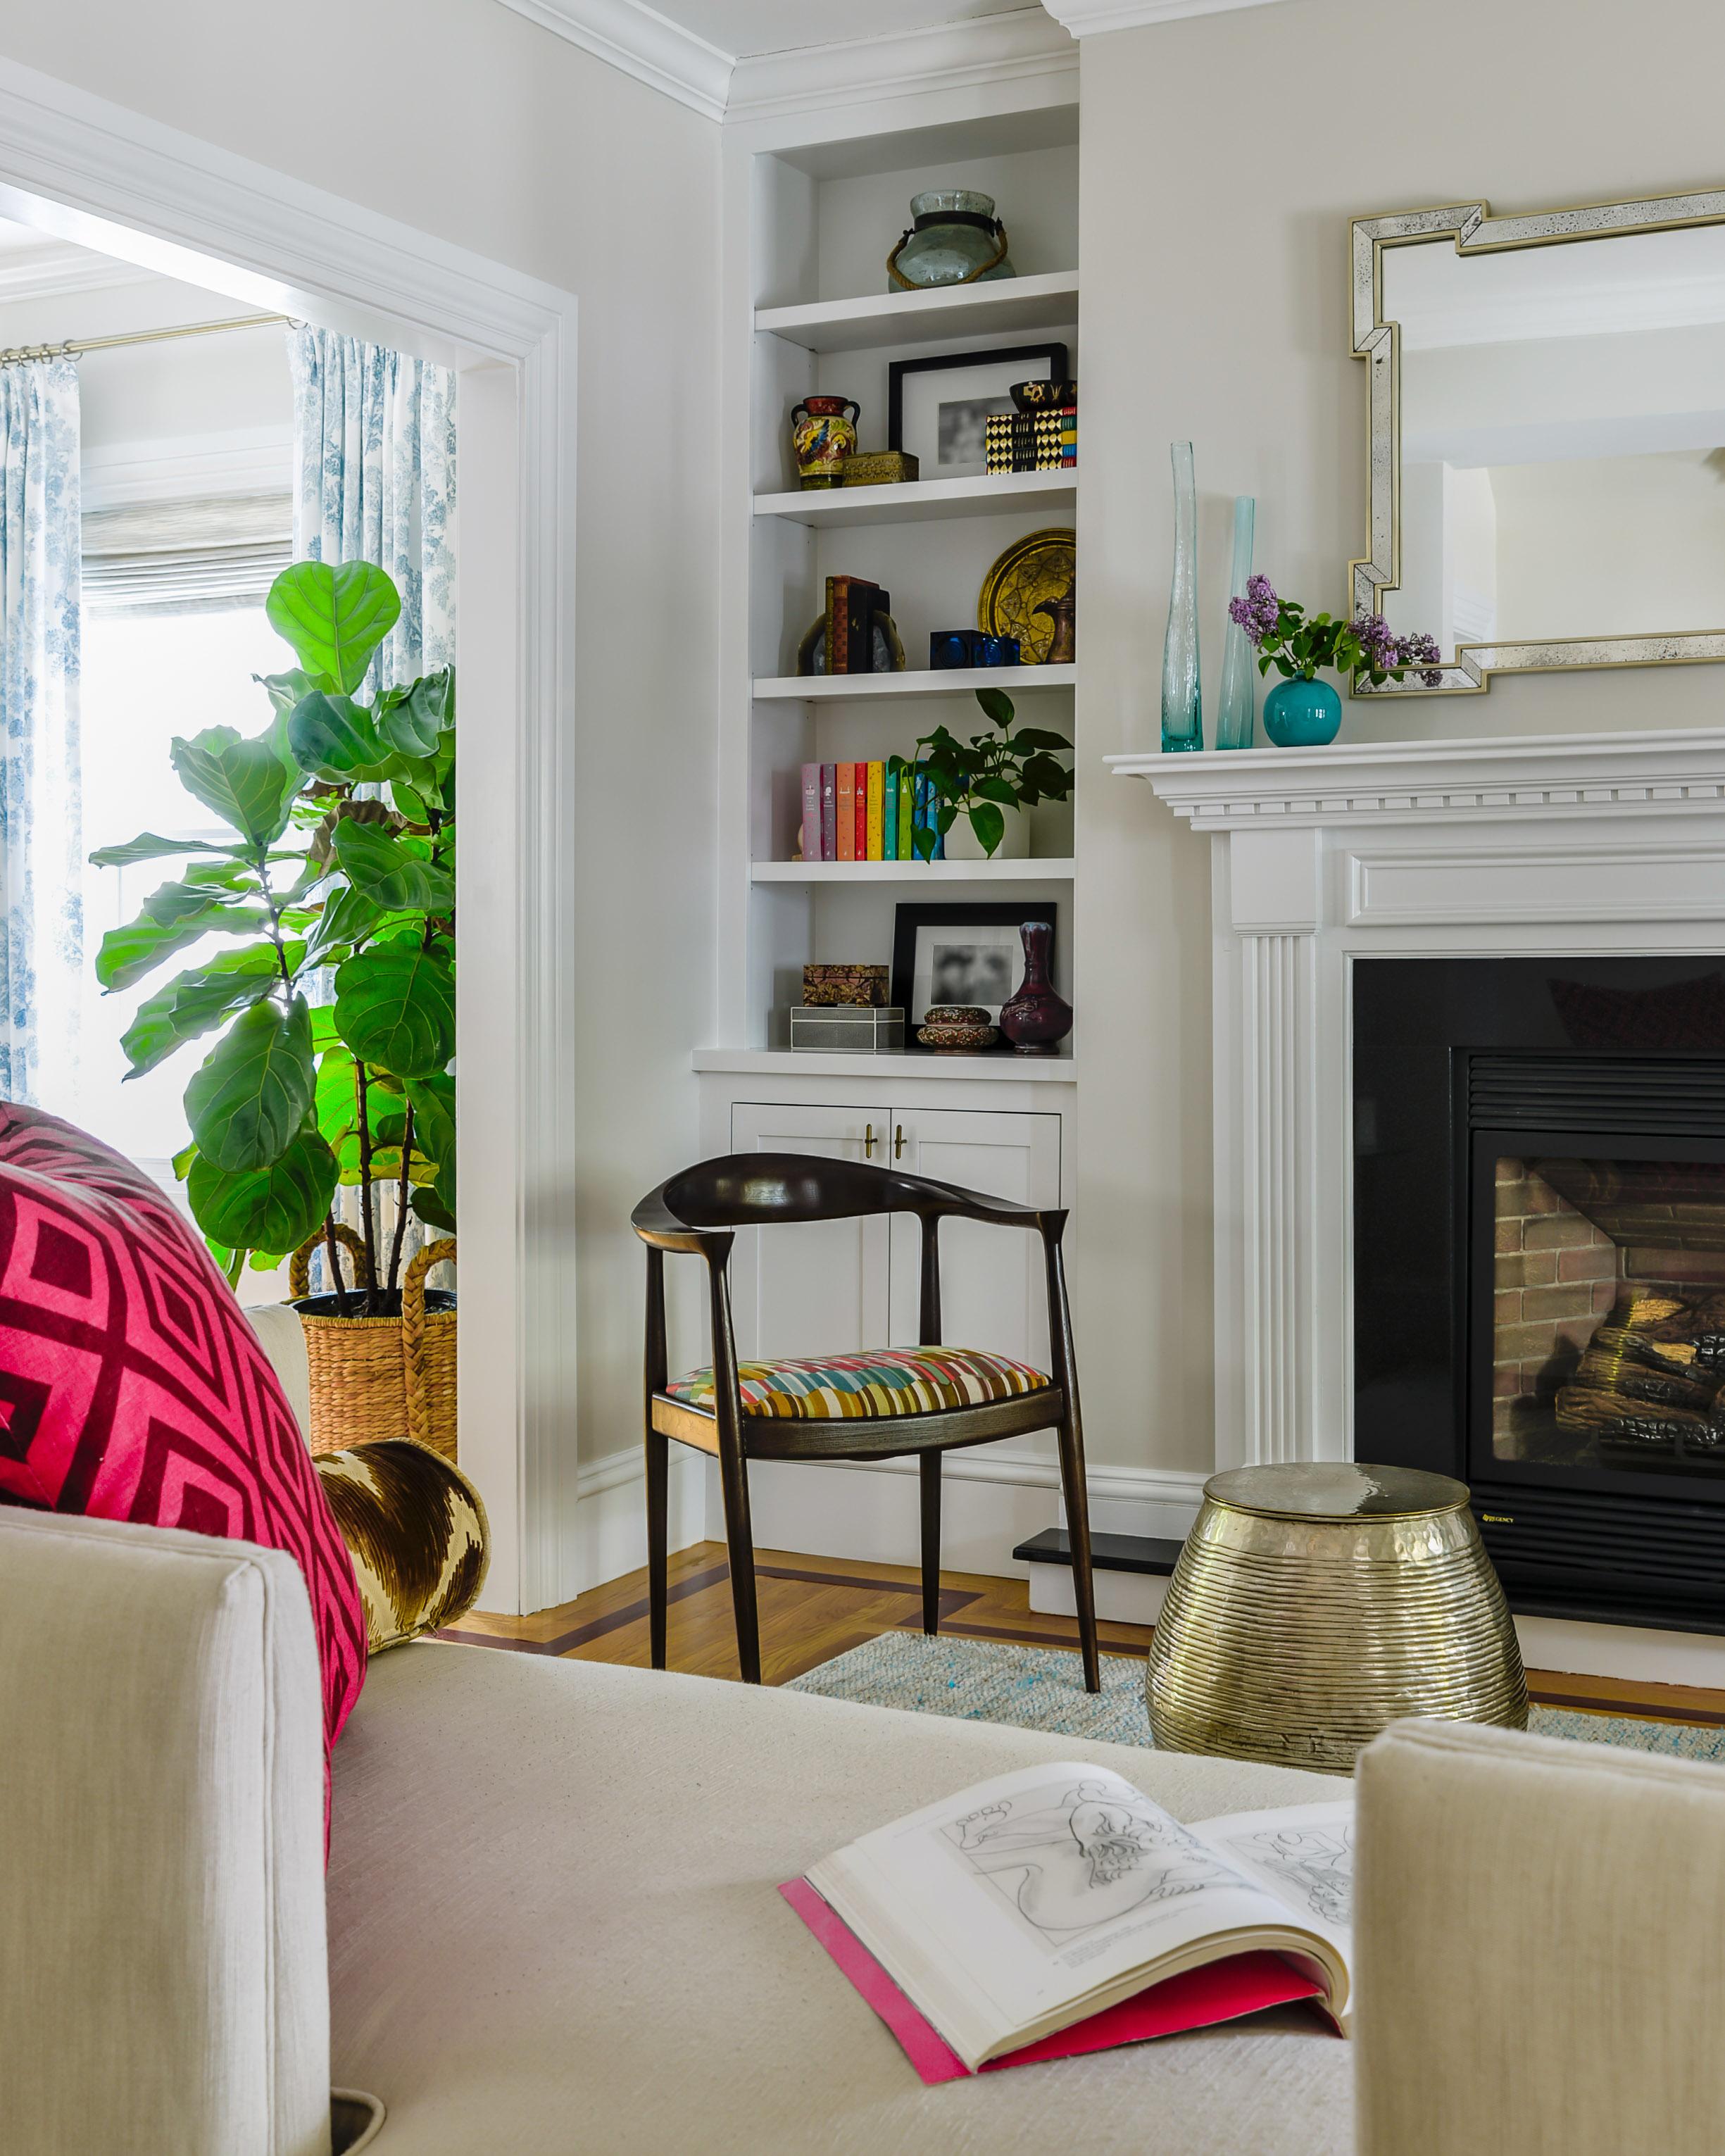 Megan Shadrick Interiors Appleton project final 39-.jpg